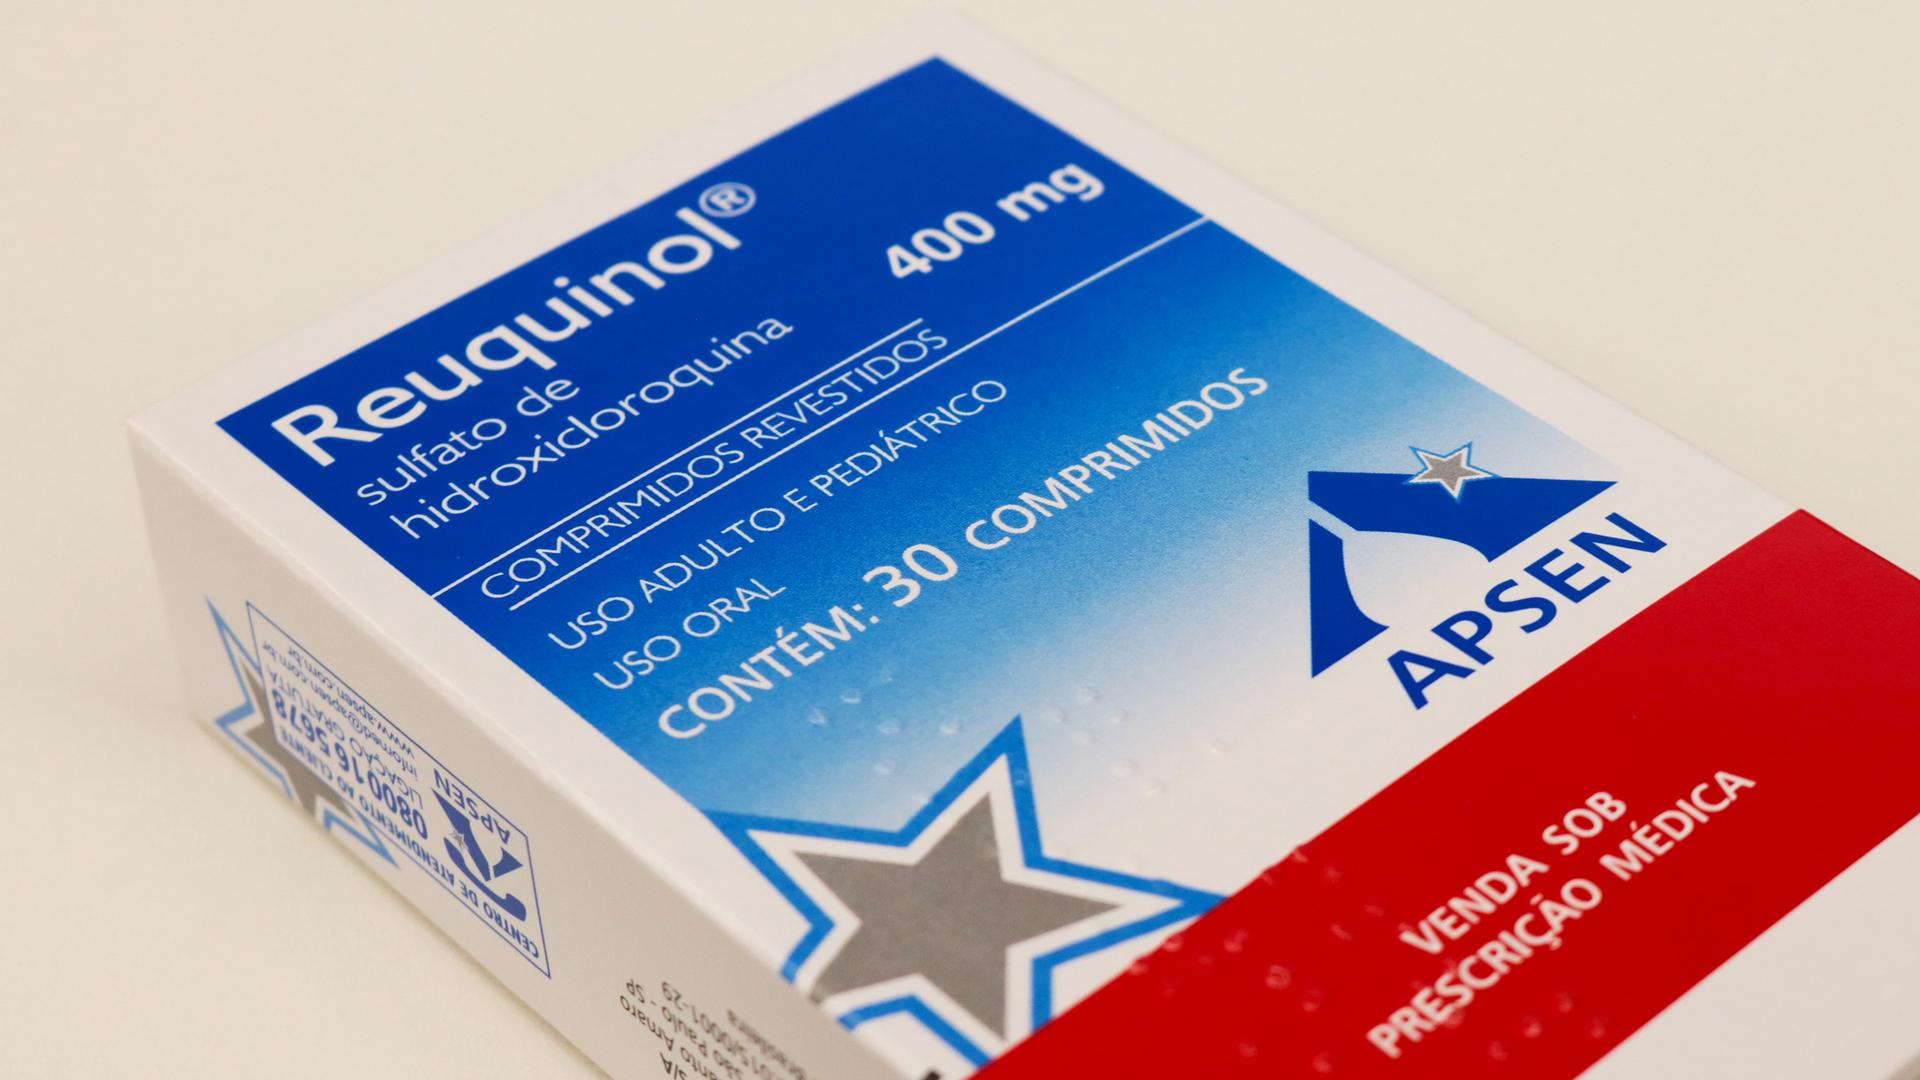 Sulfato de Hidroxicloroquina.